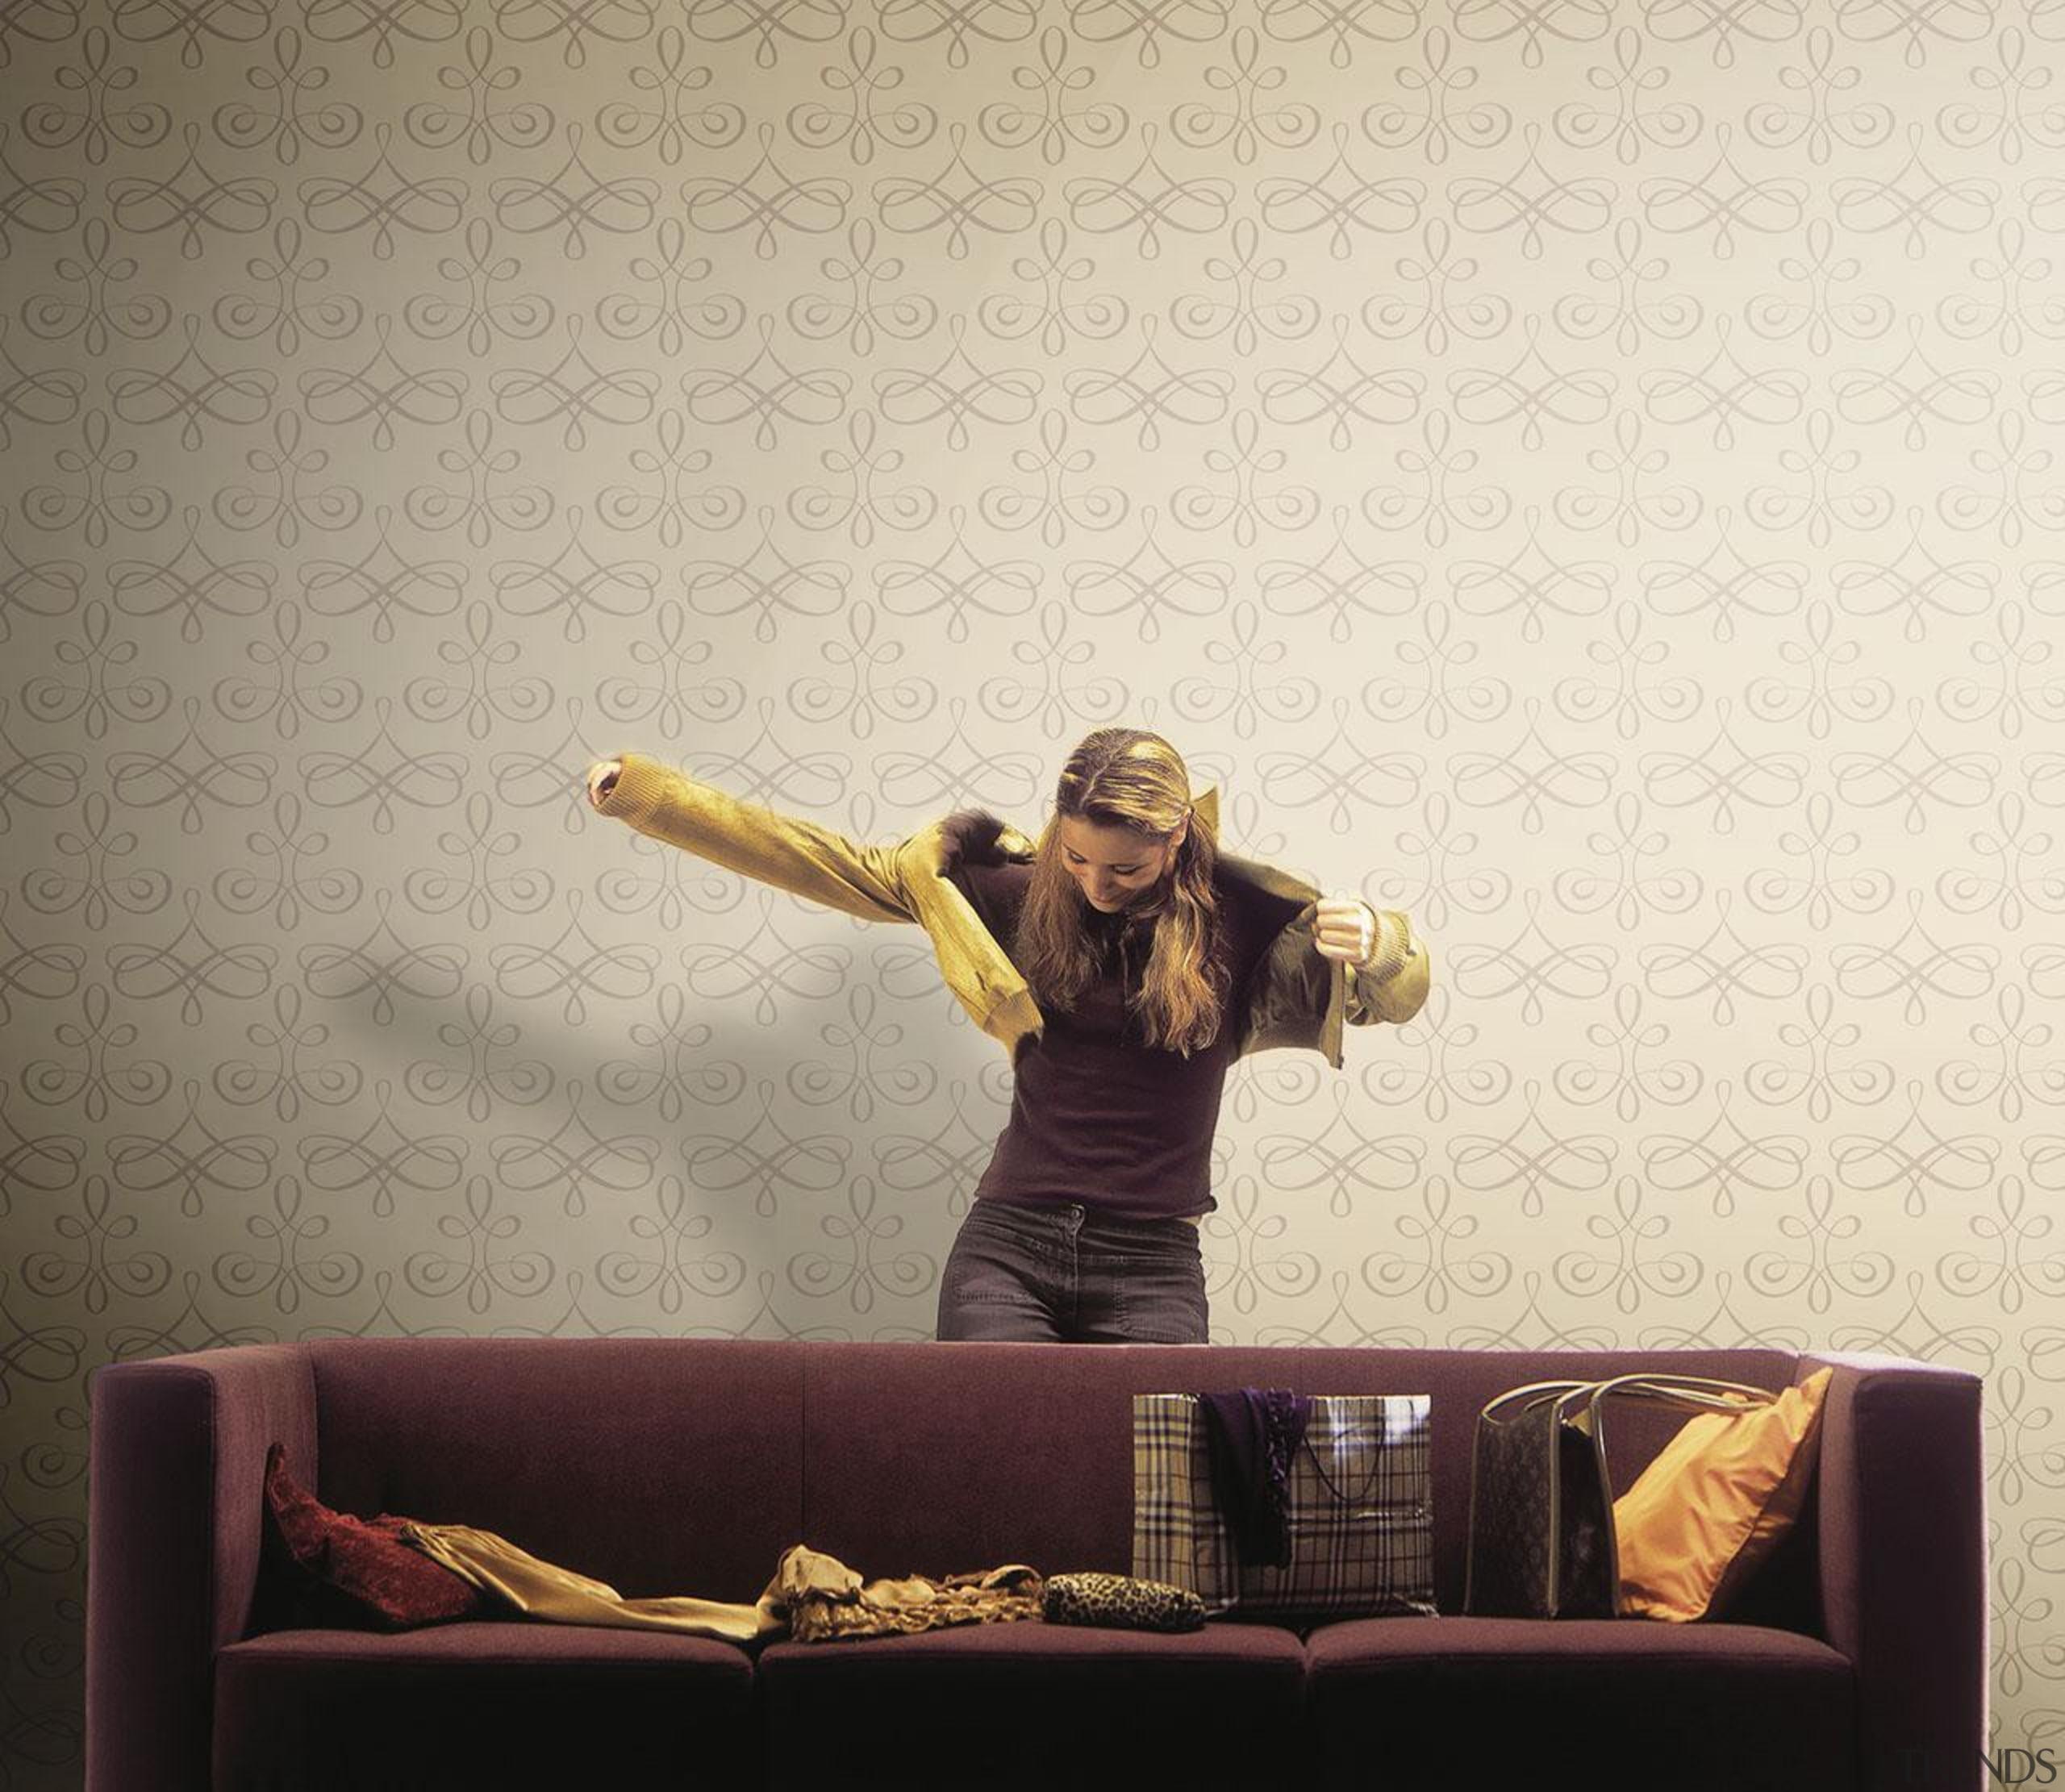 Aurora Range - Aurora Range - arm | arm, human behavior, wall, wallpaper, white